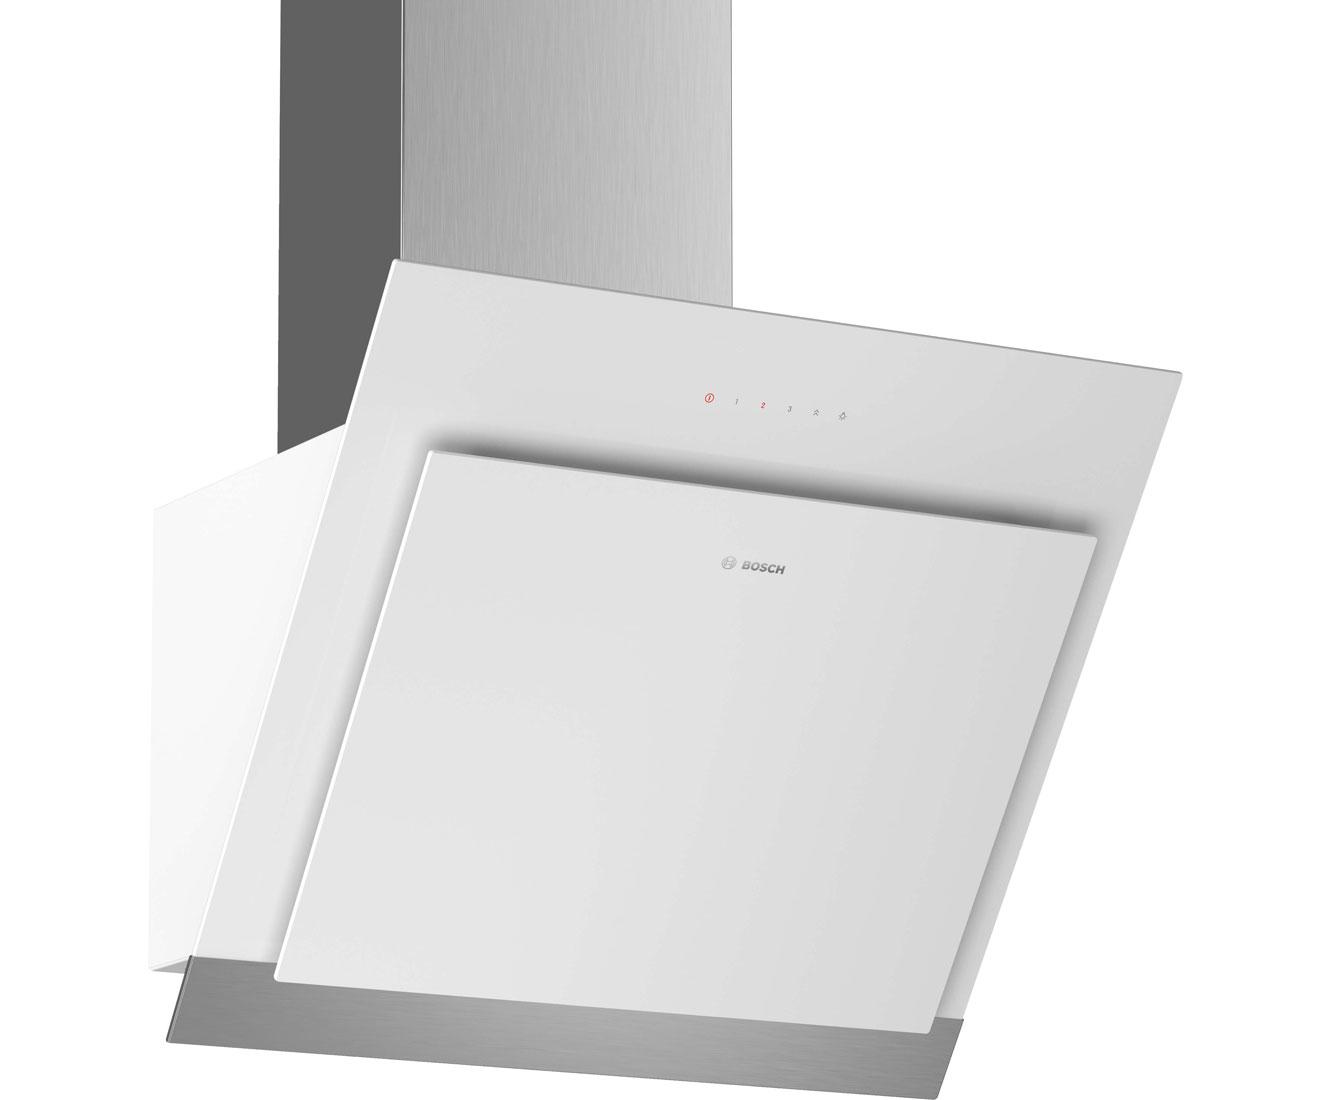 Dunstabzugshaube Kopffrei Bosch 2021